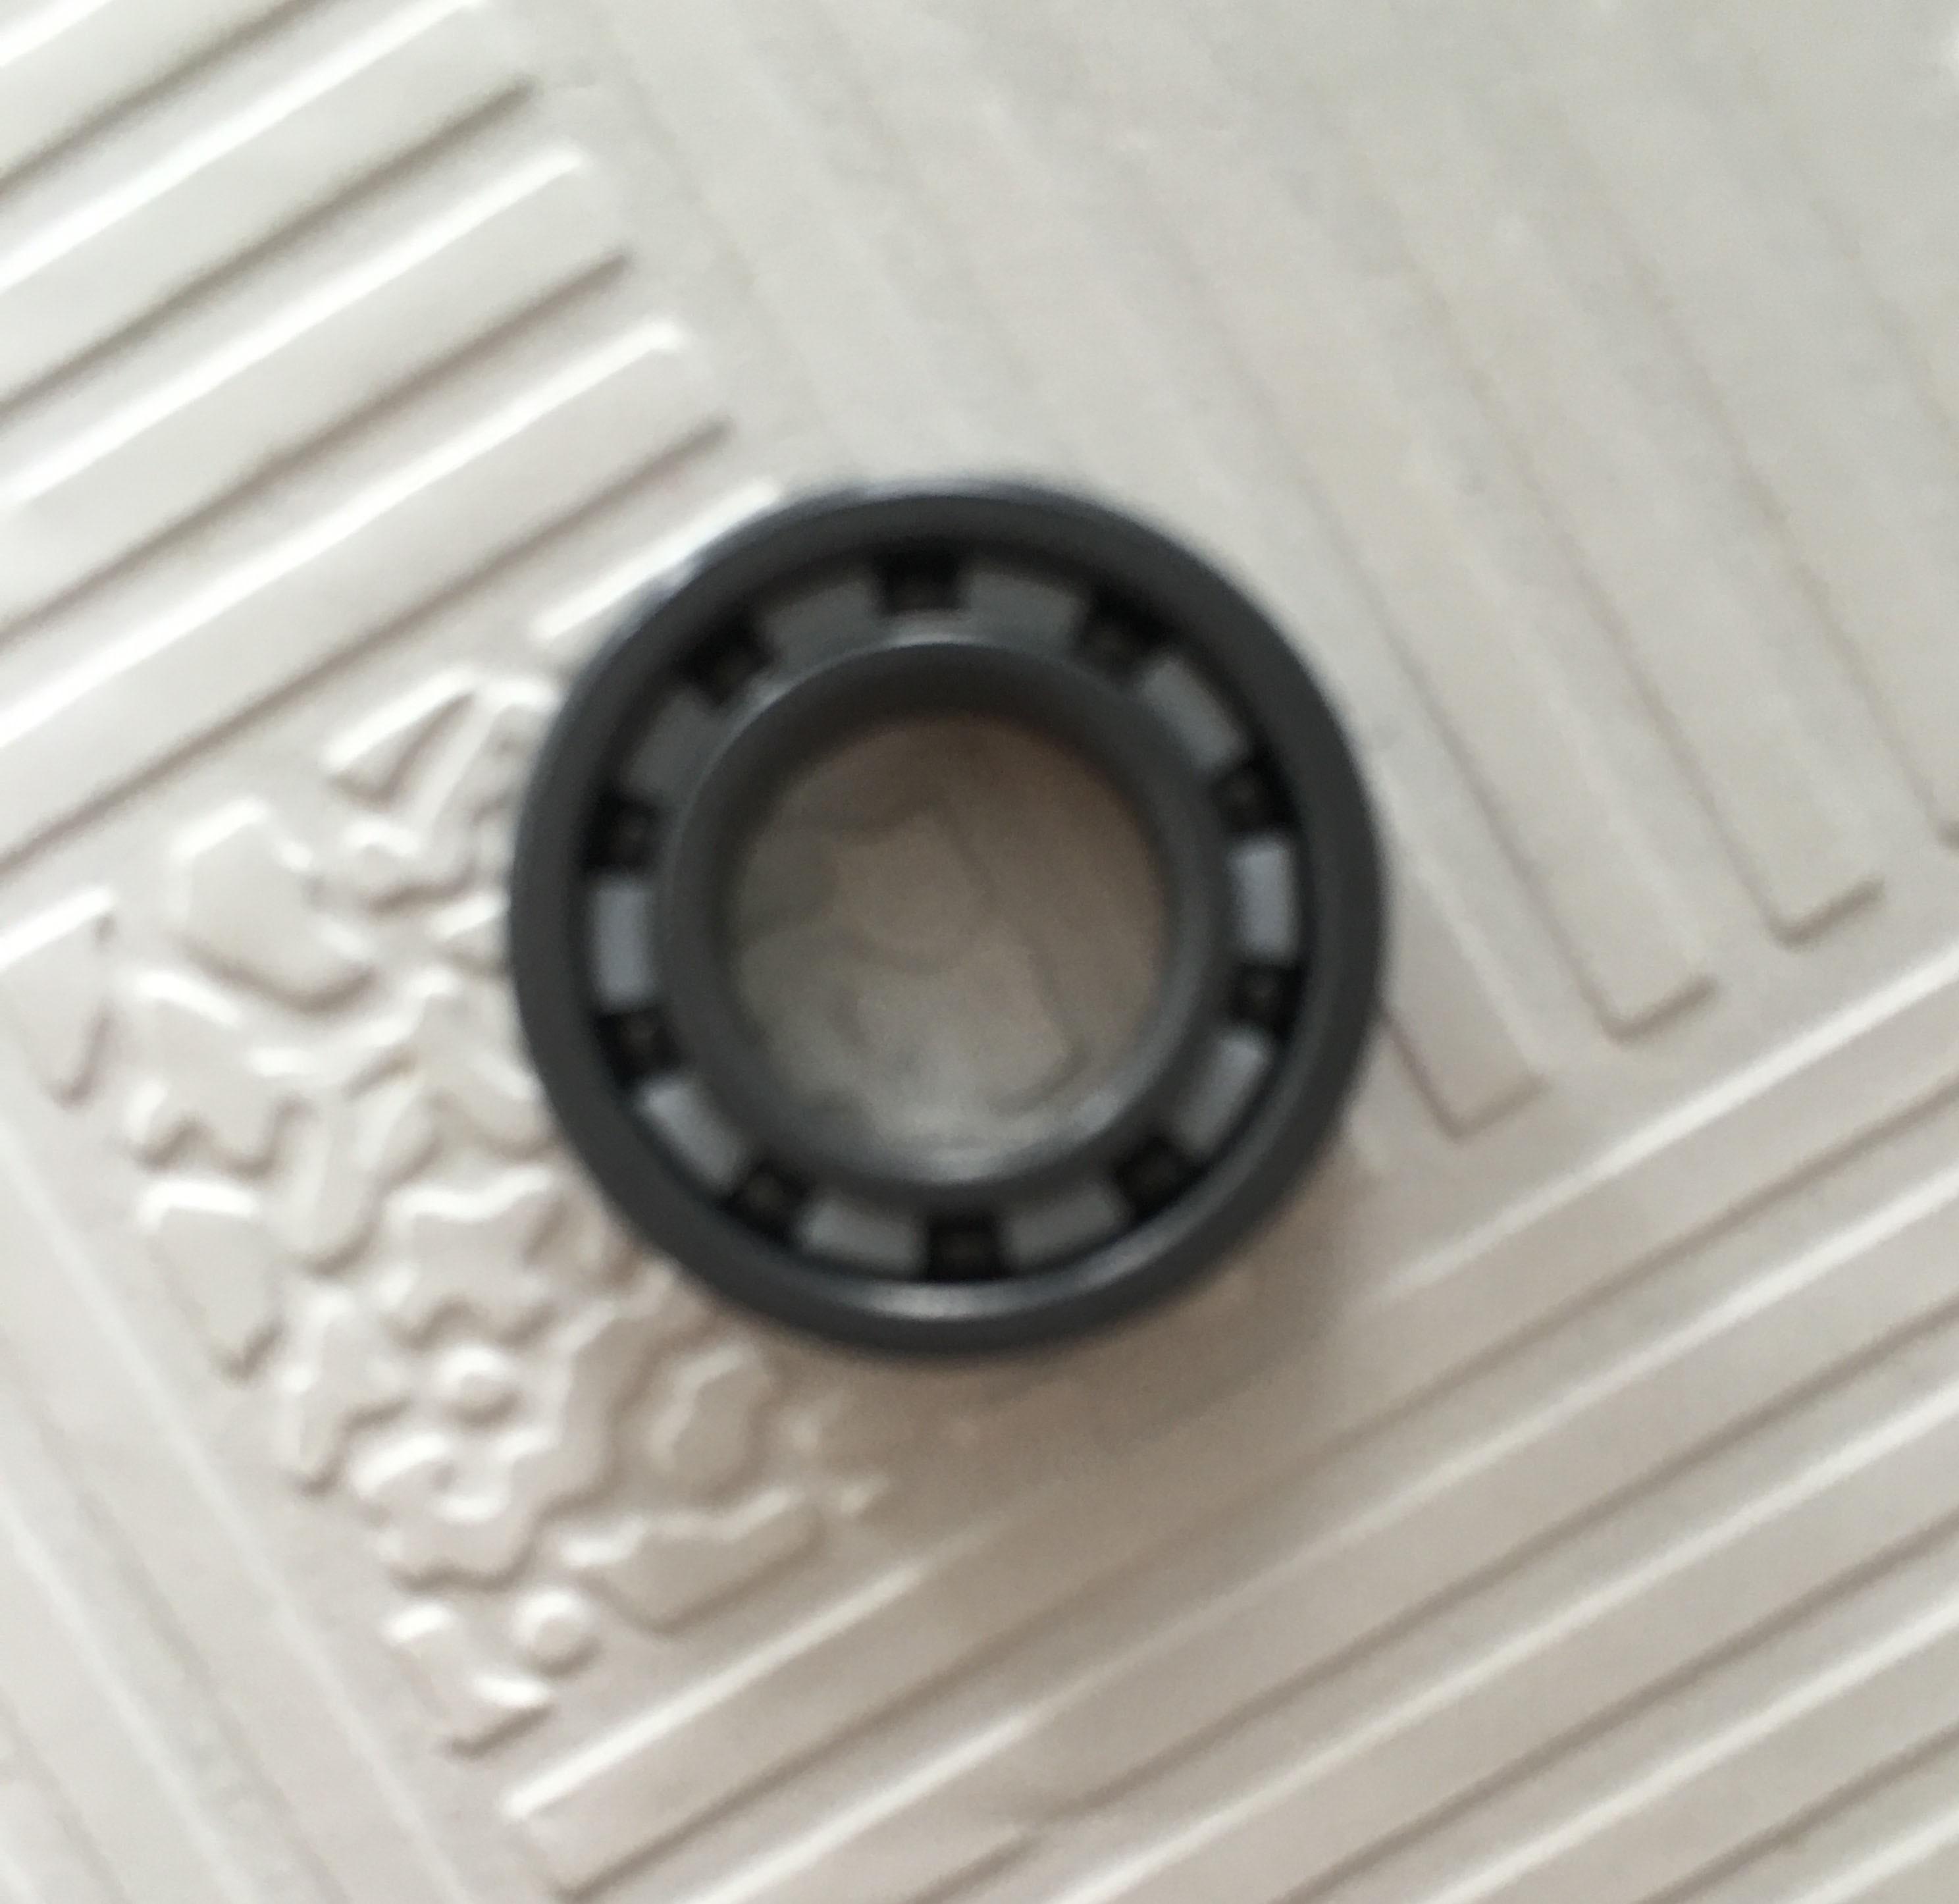 Free Shipping 698 619/8 8*19*6 mm Full SI3N4 ceramic ball bearing free shipping 697 619 7 7x17x5 mm full zro2 ceramic ball bearing